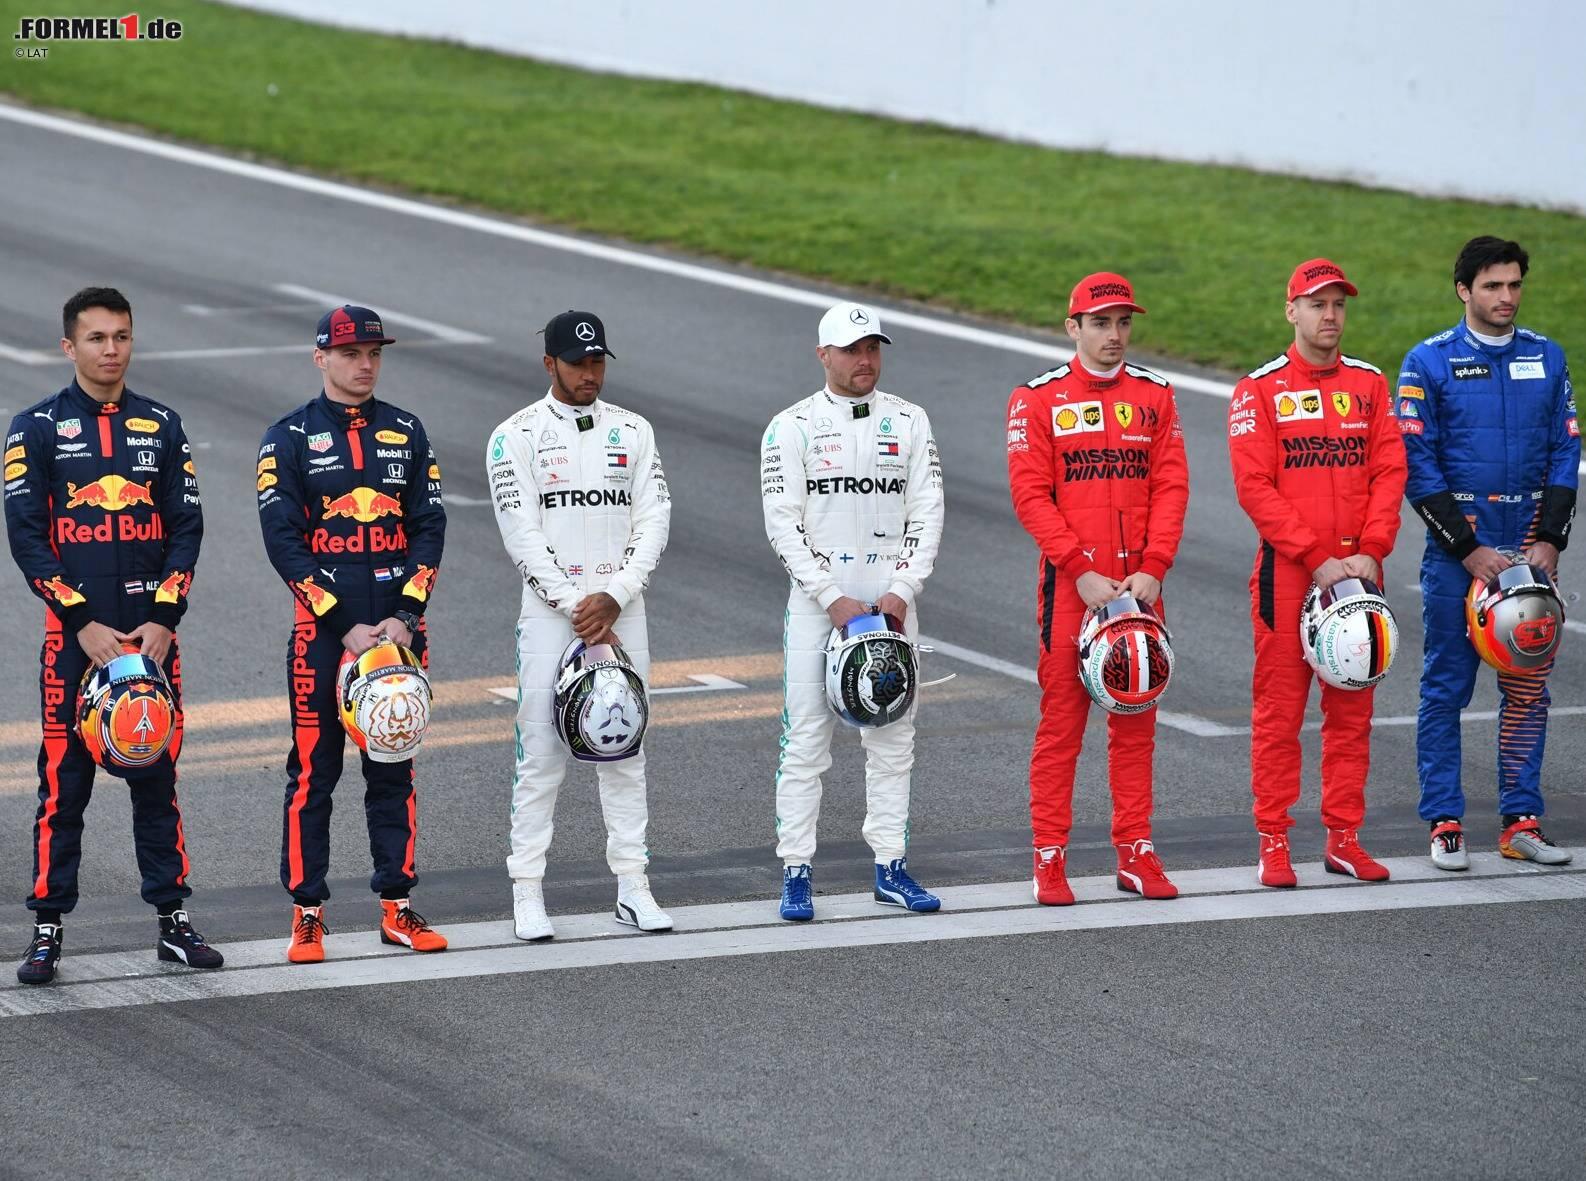 Bester Formel 1 Fahrer